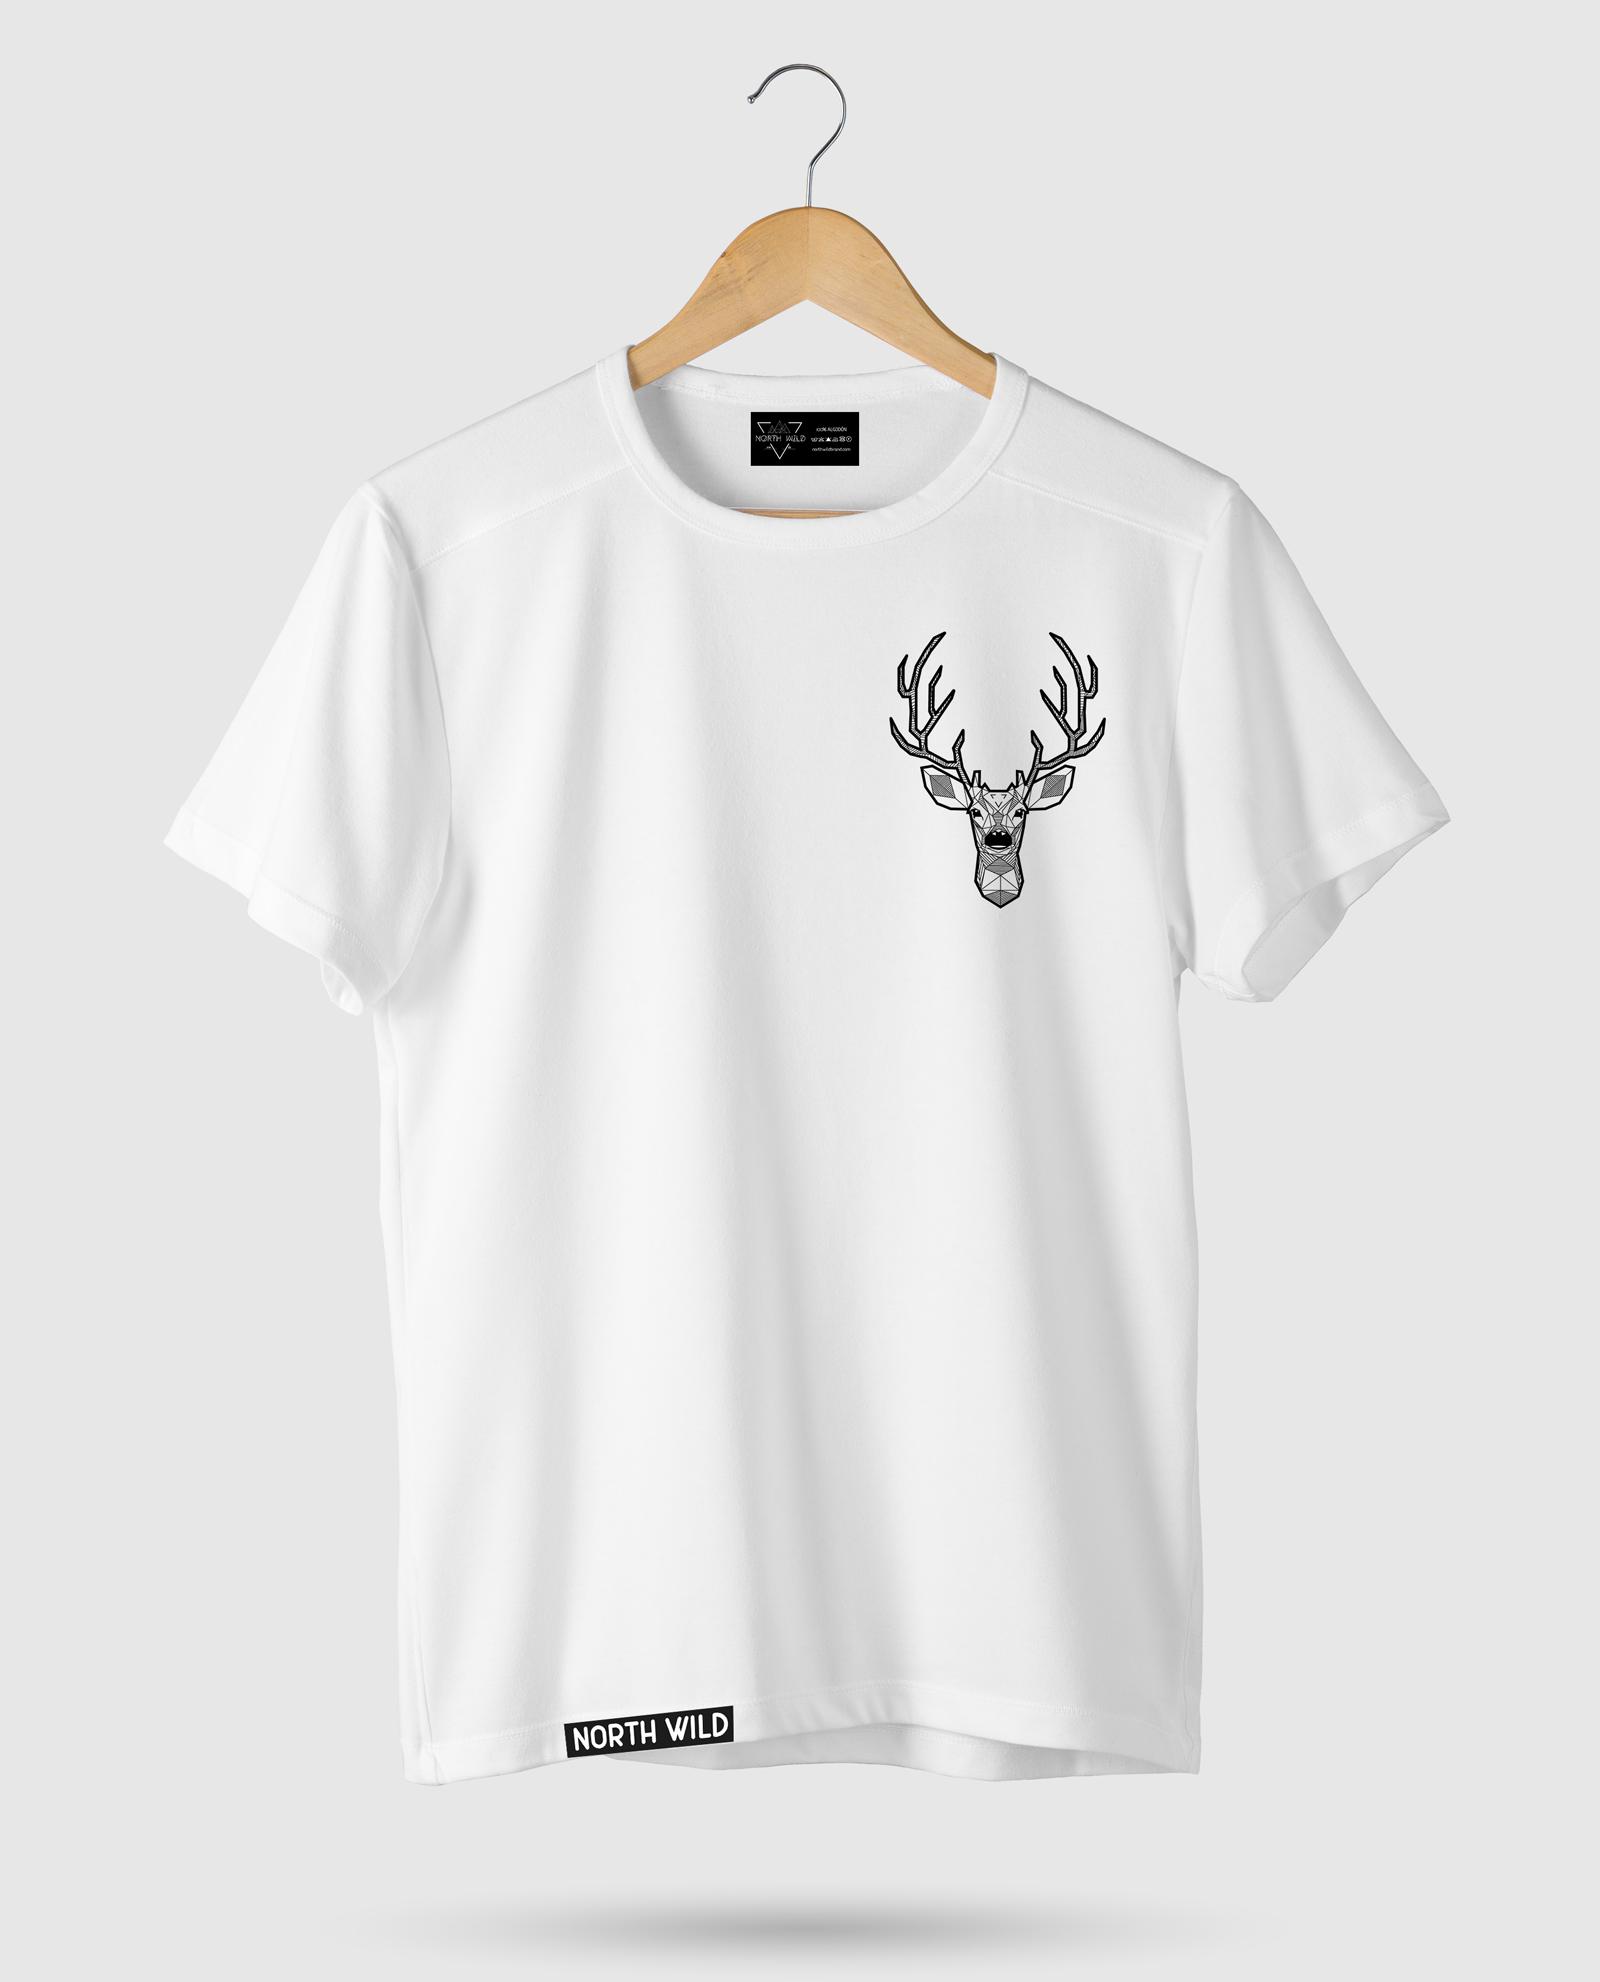 Camisetas animales geométricos Northwild